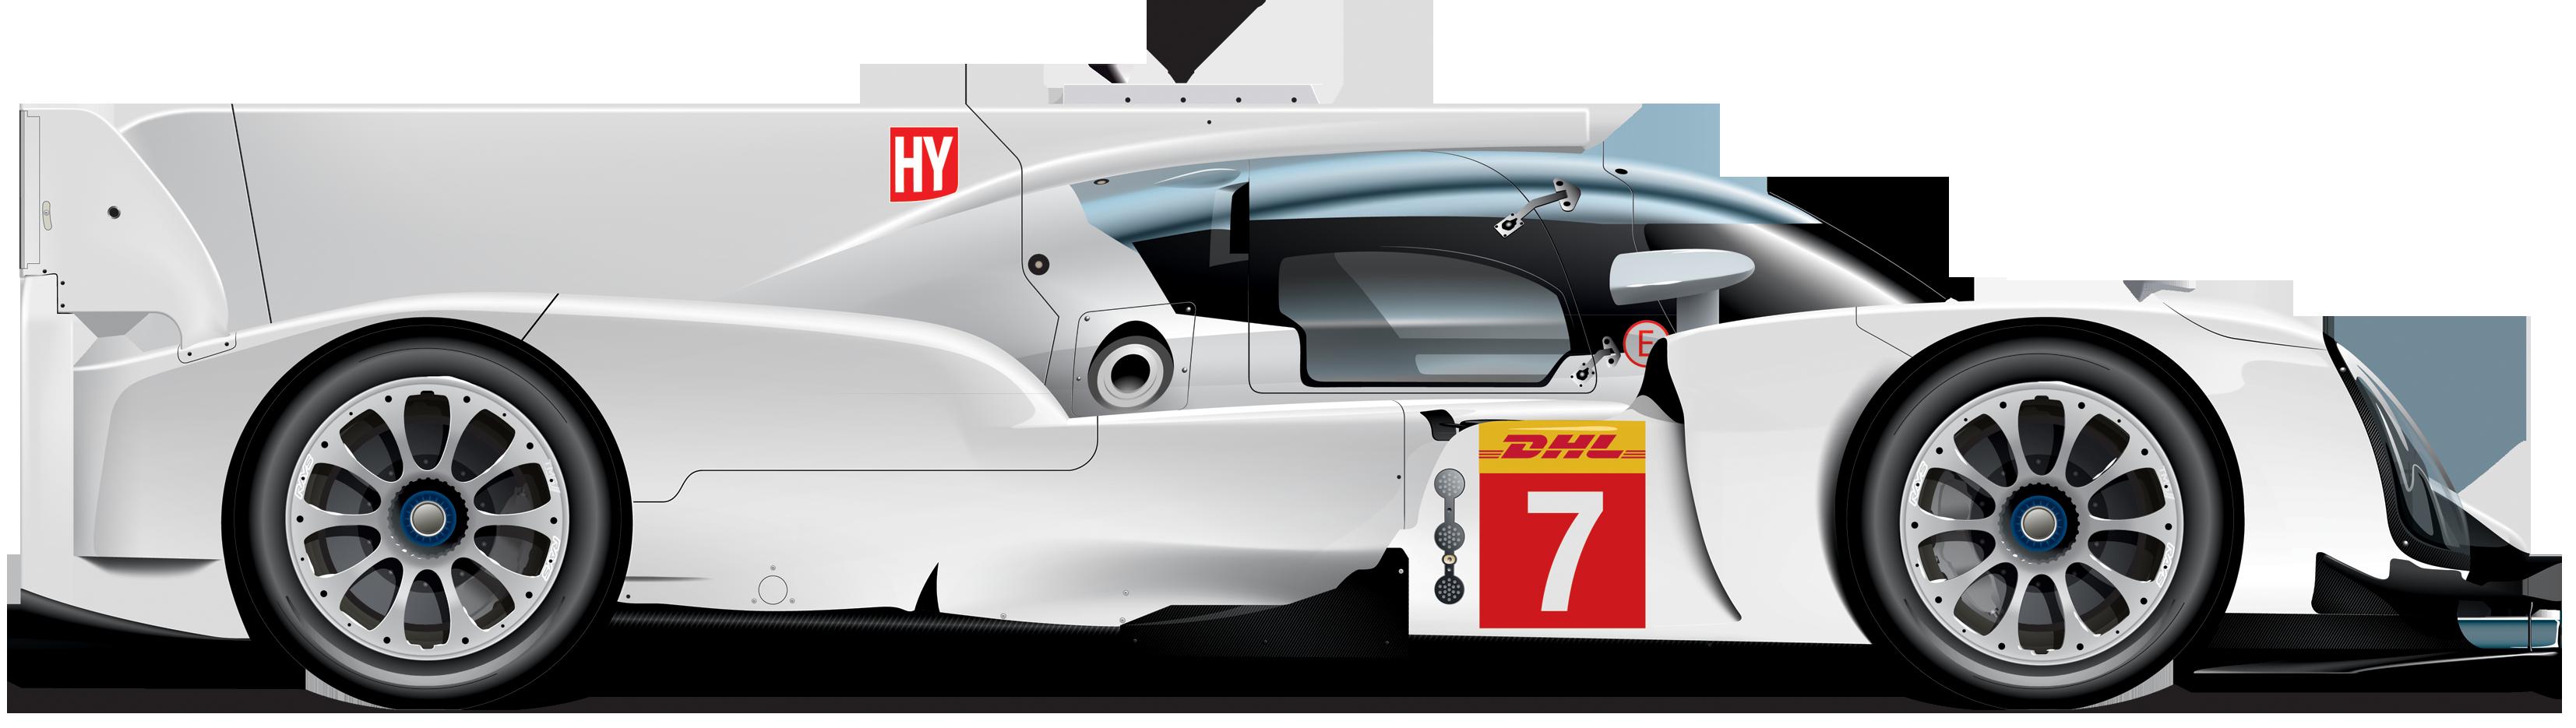 Classes - FIA World Endurance Championship